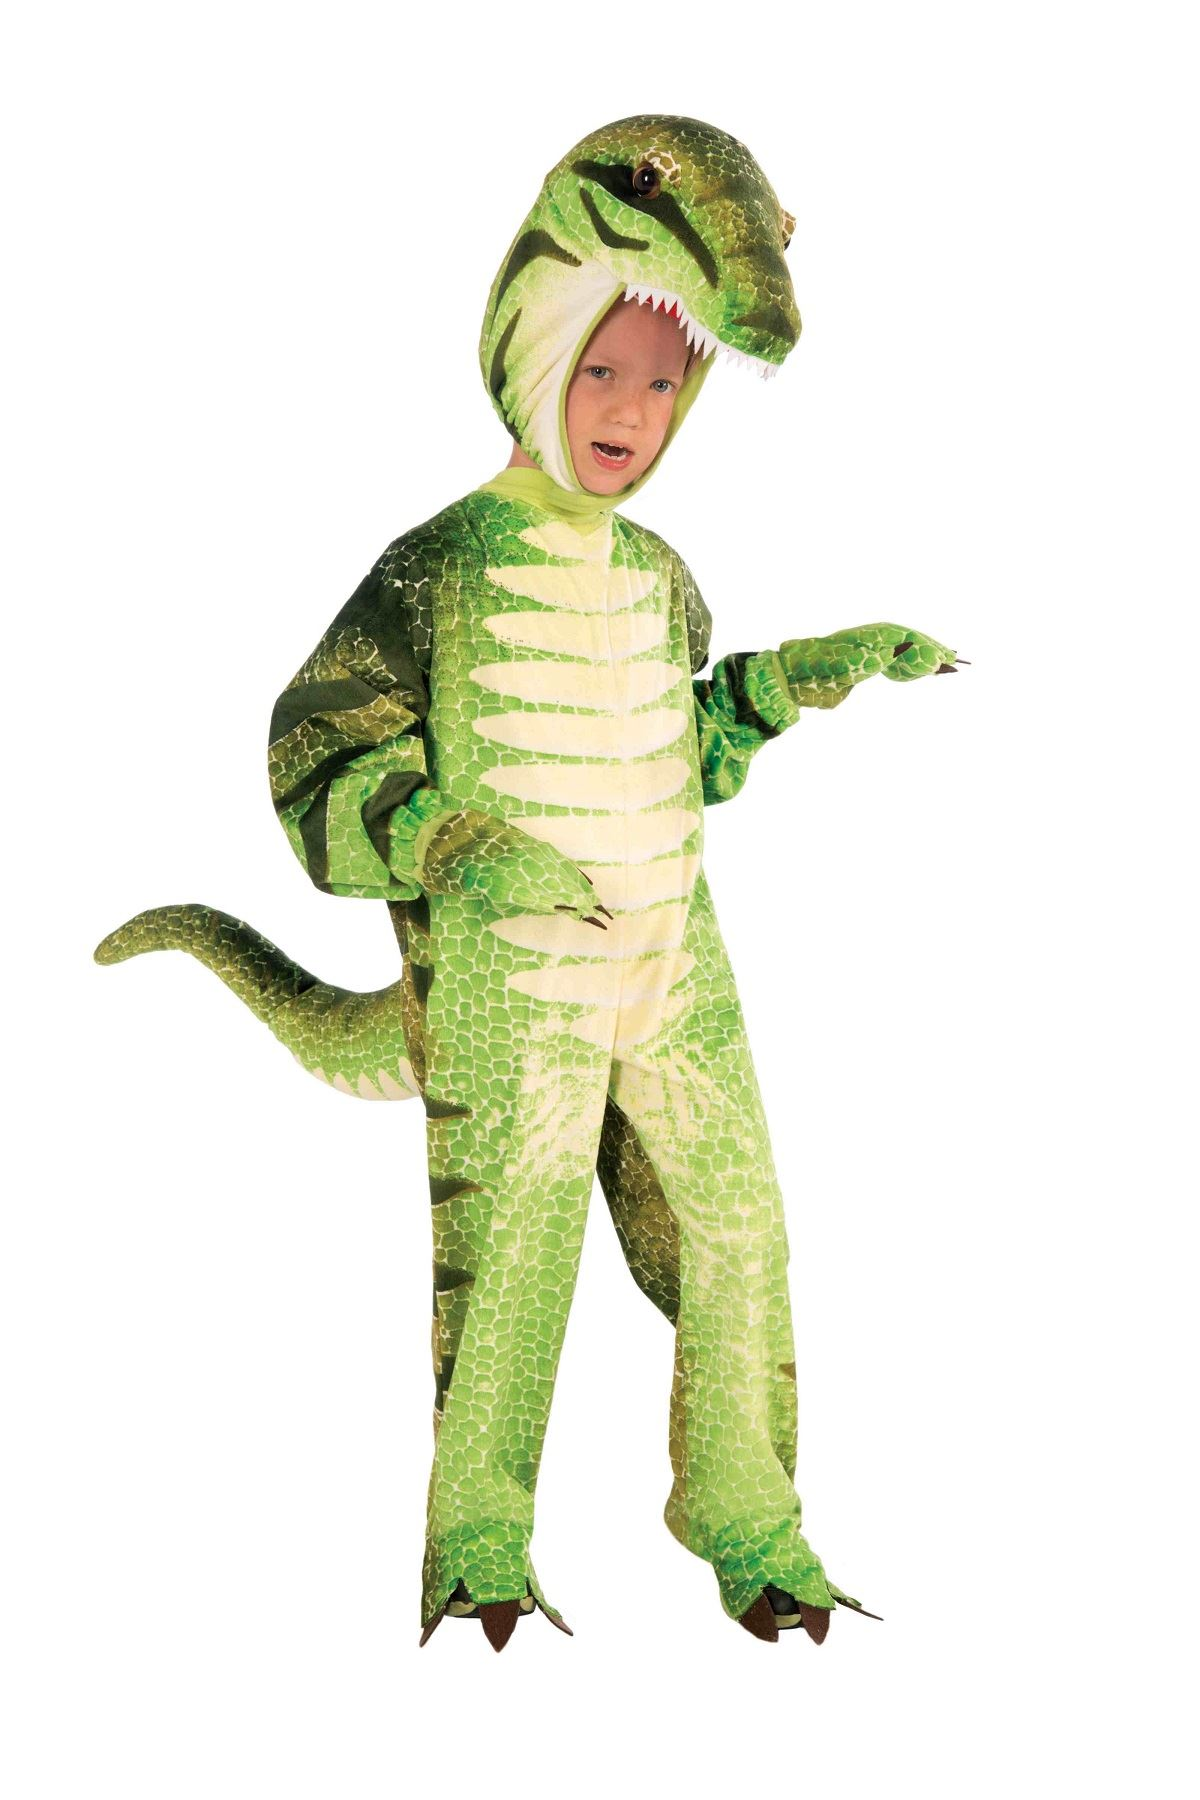 Dinosaur Boys T Rex Halloween Costume   $19.99   The Costume Land